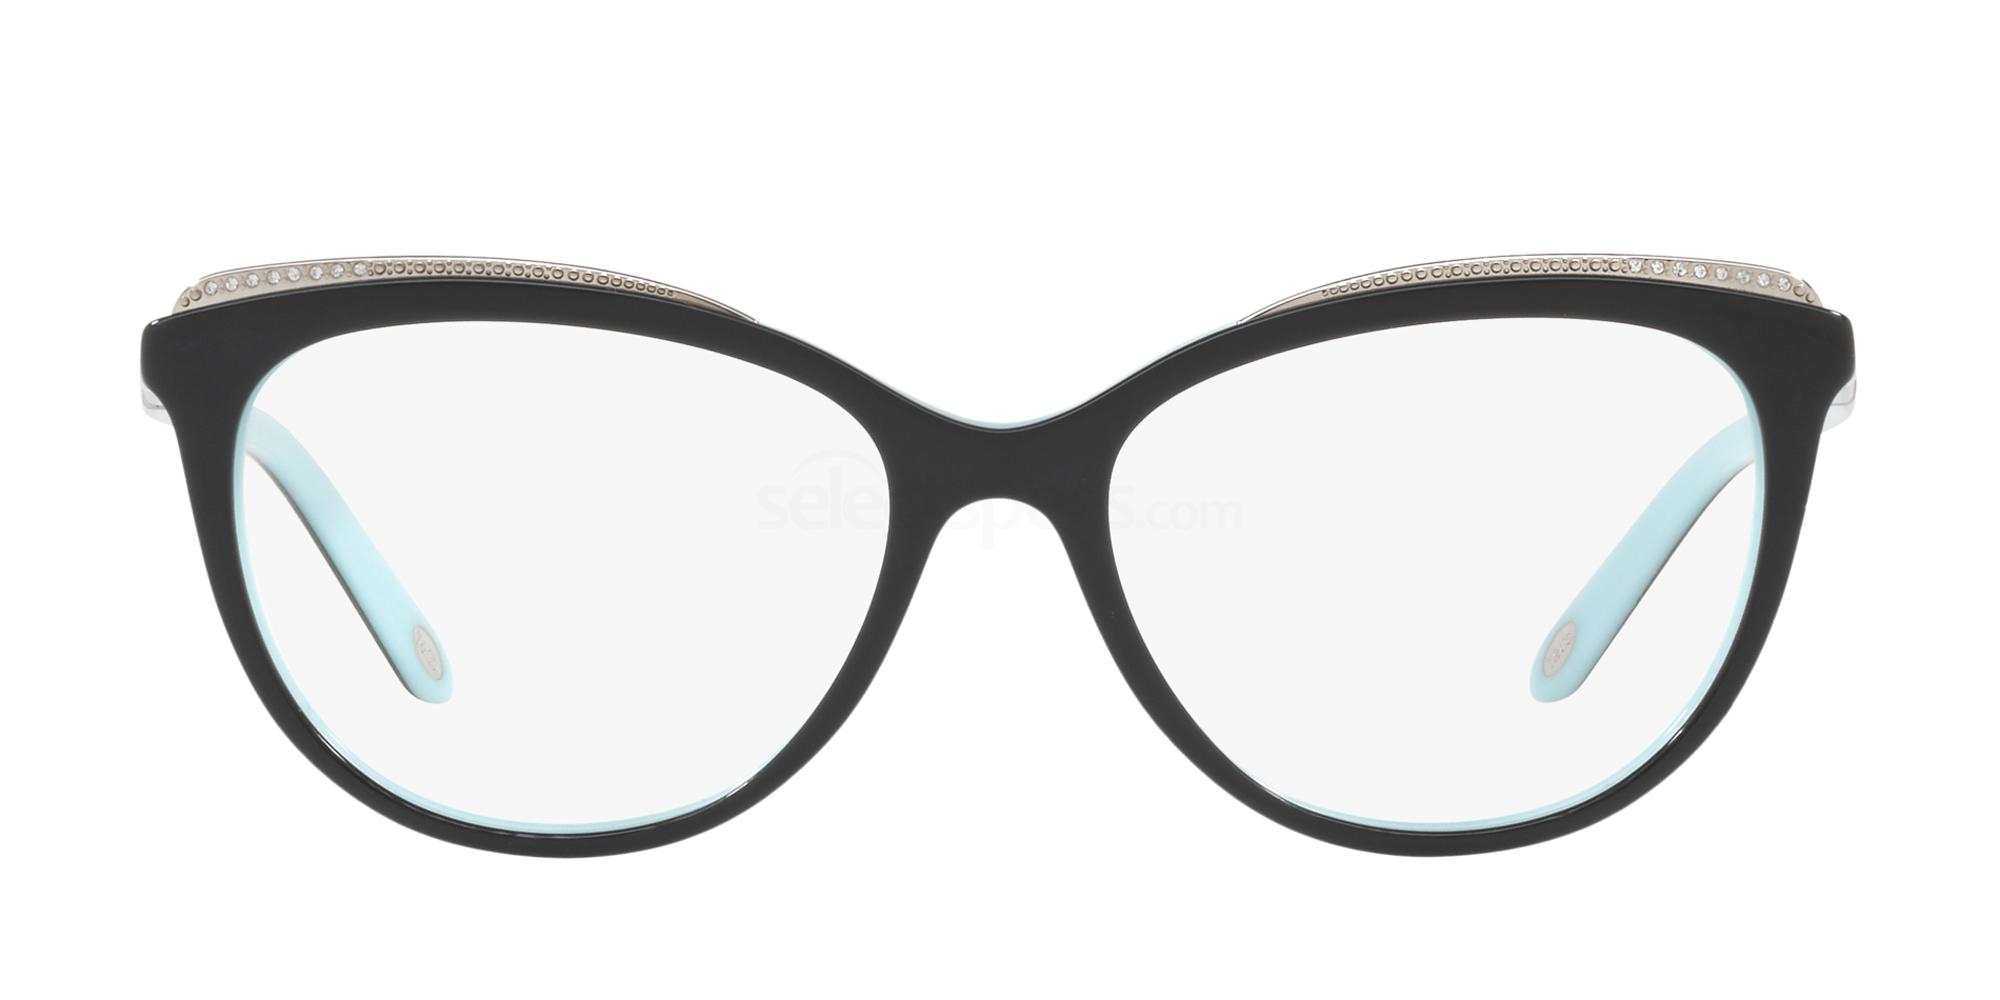 6a10f127aed7 Tiffany   Co. TF2147B glasses